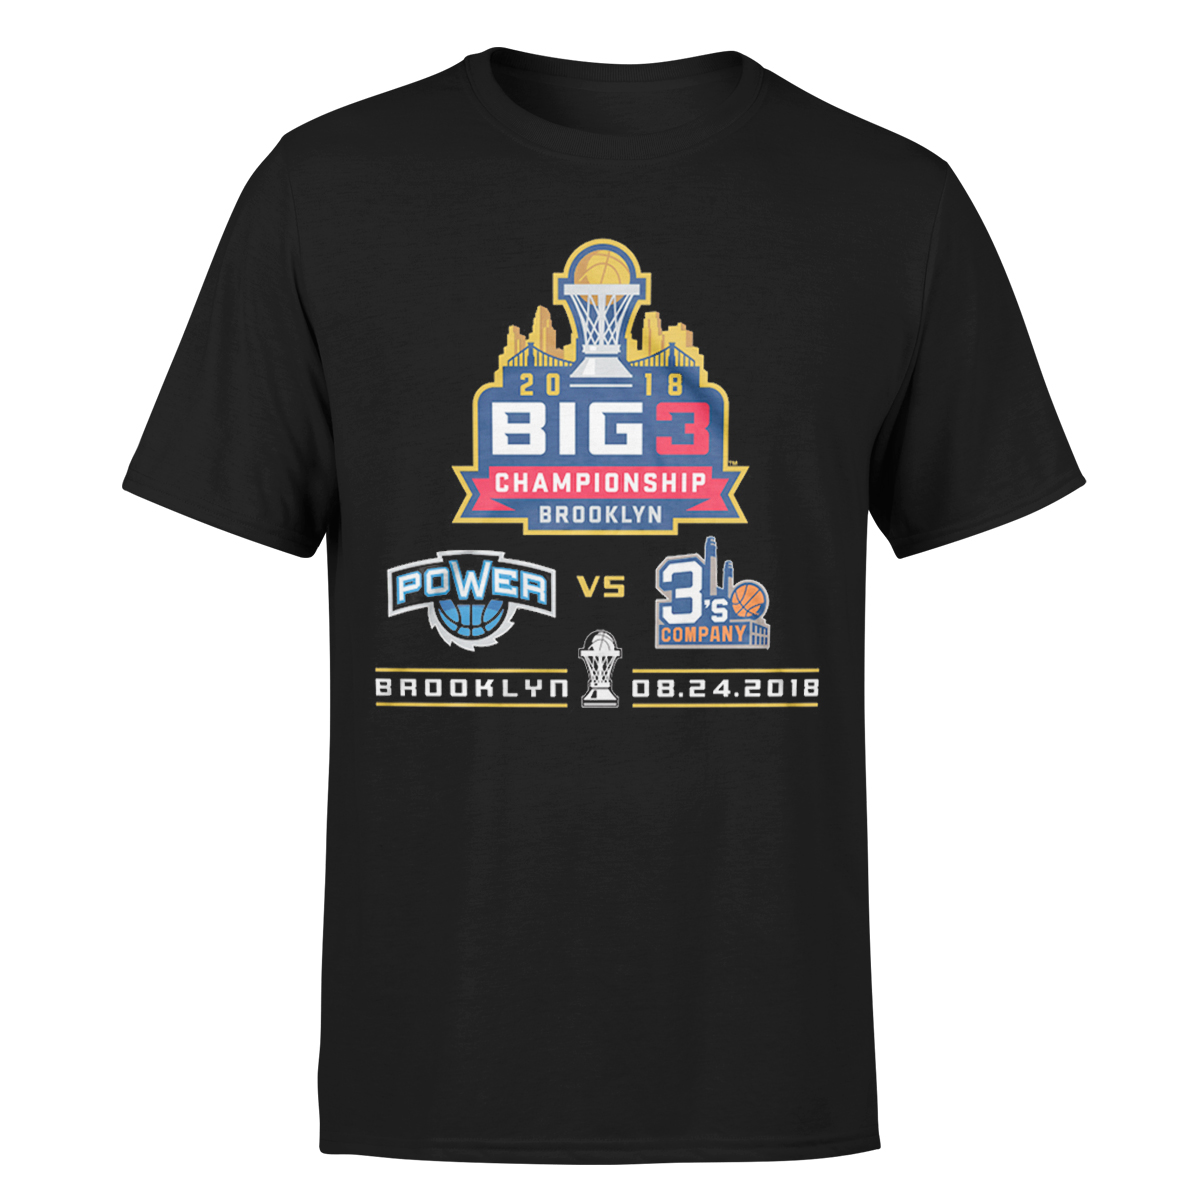 2018 Big3 Championship Black T-shirt